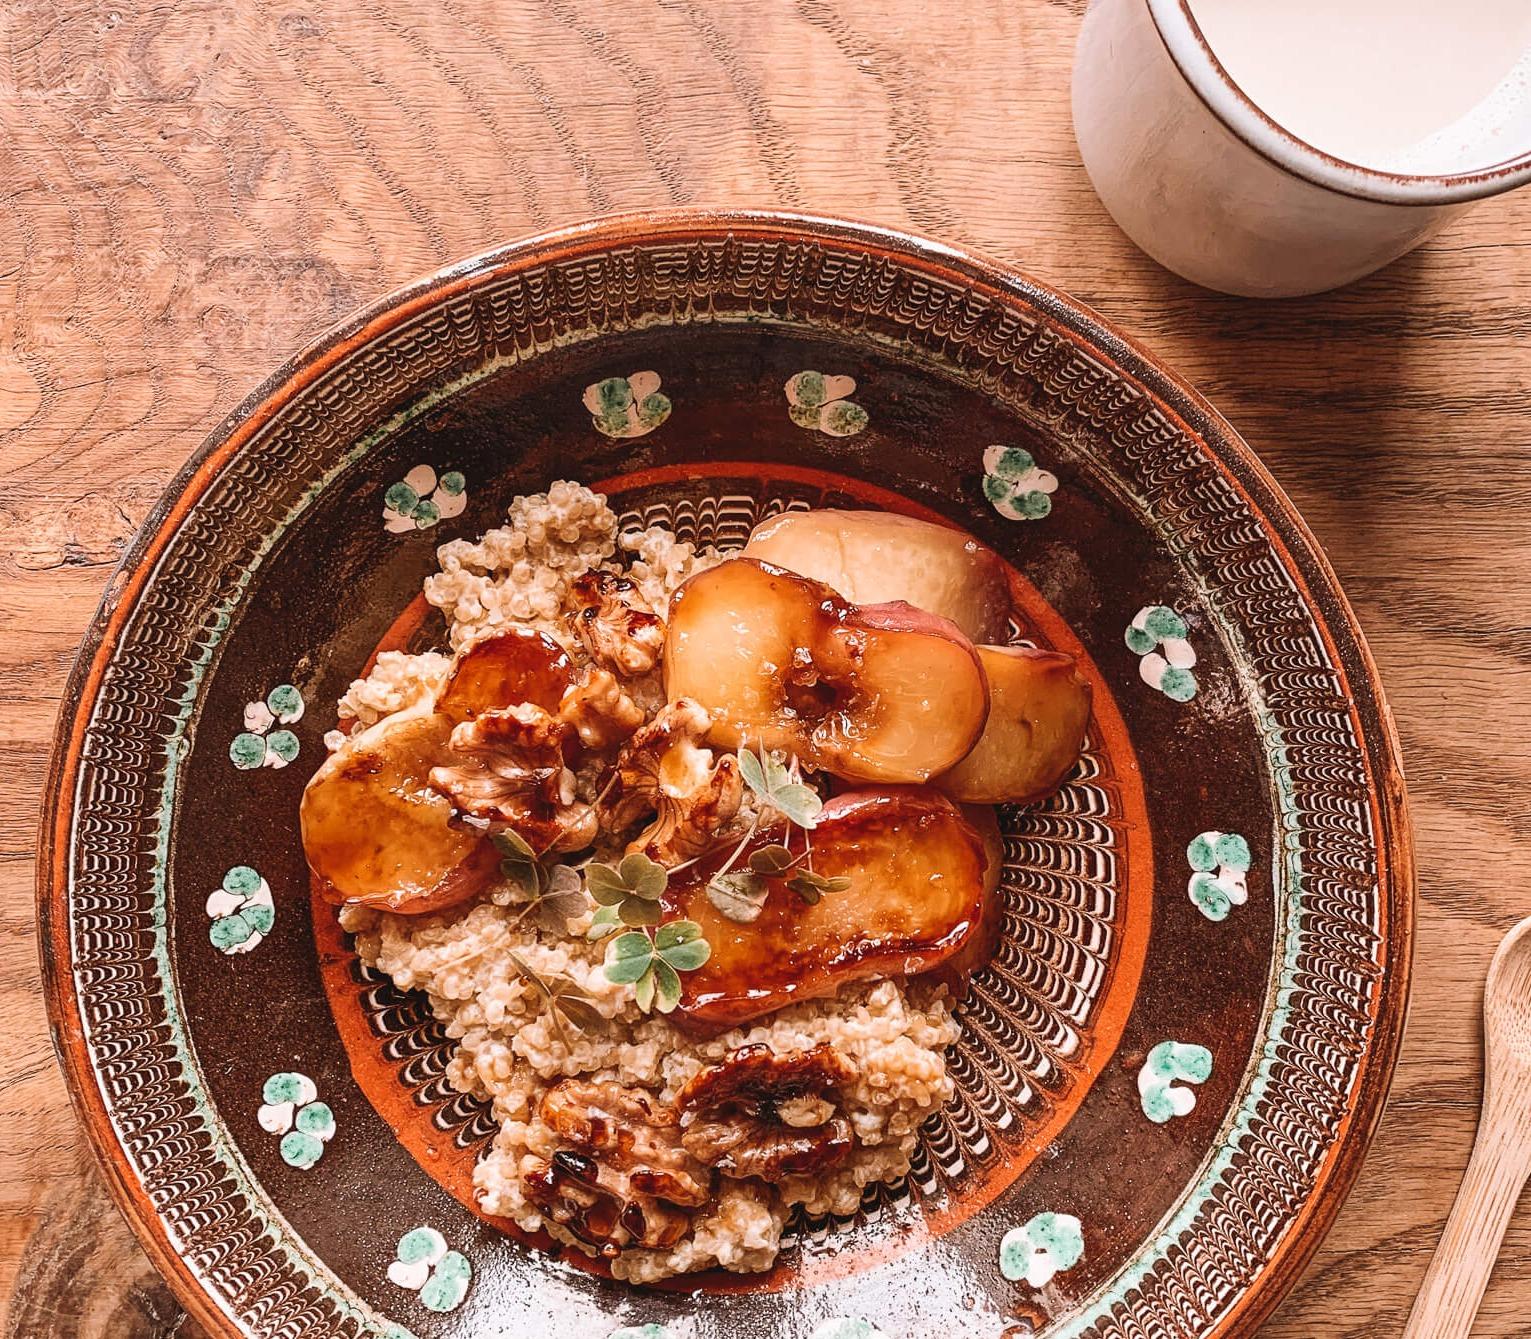 Quinoagrød med karamelliserede ferskner og valnødder